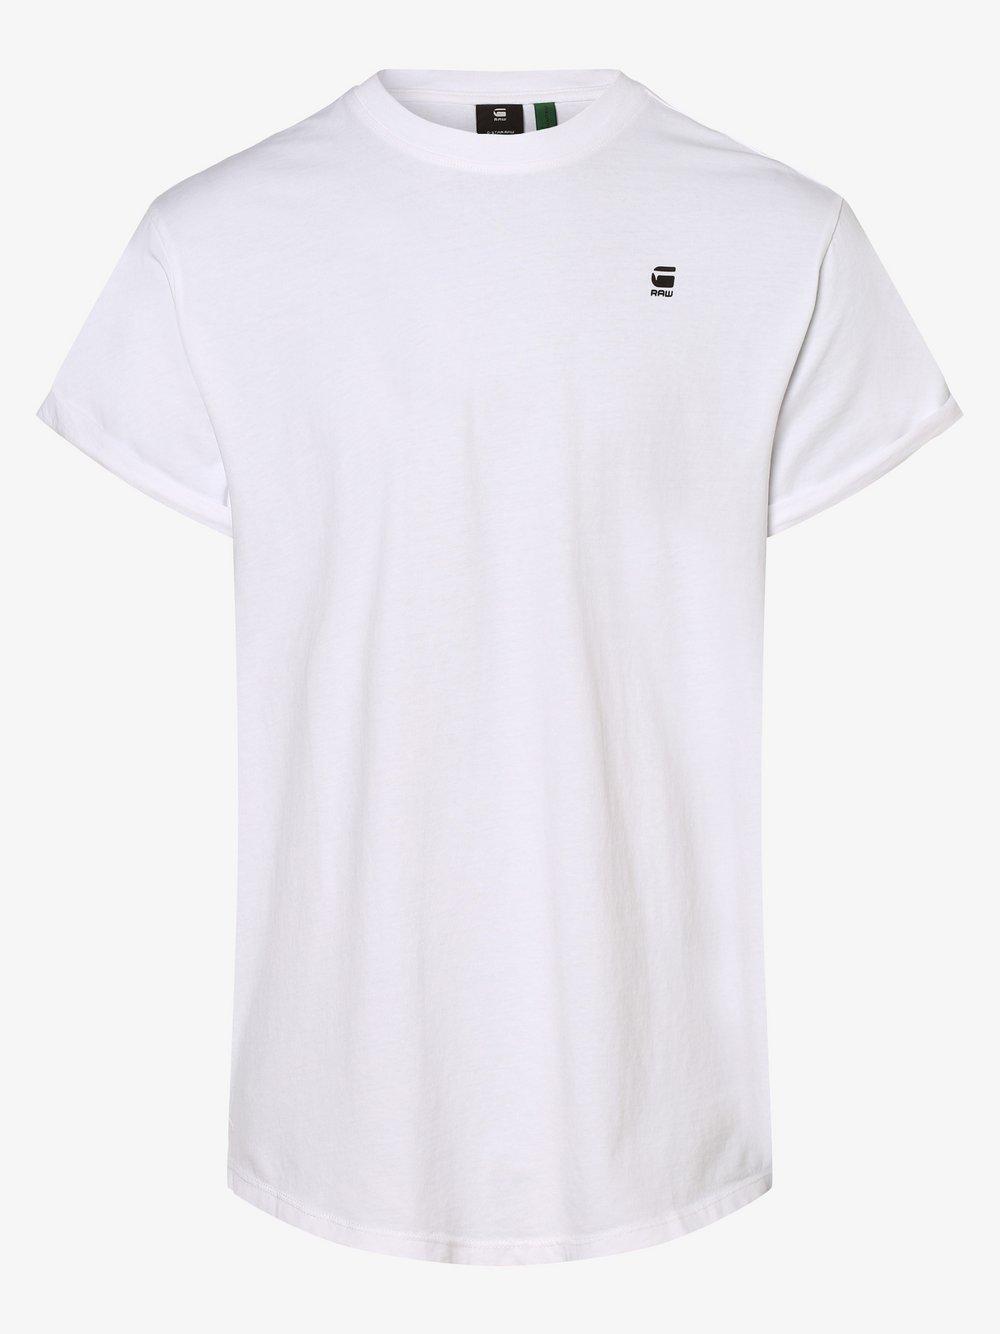 G-Star RAW - T-shirt męski, biały